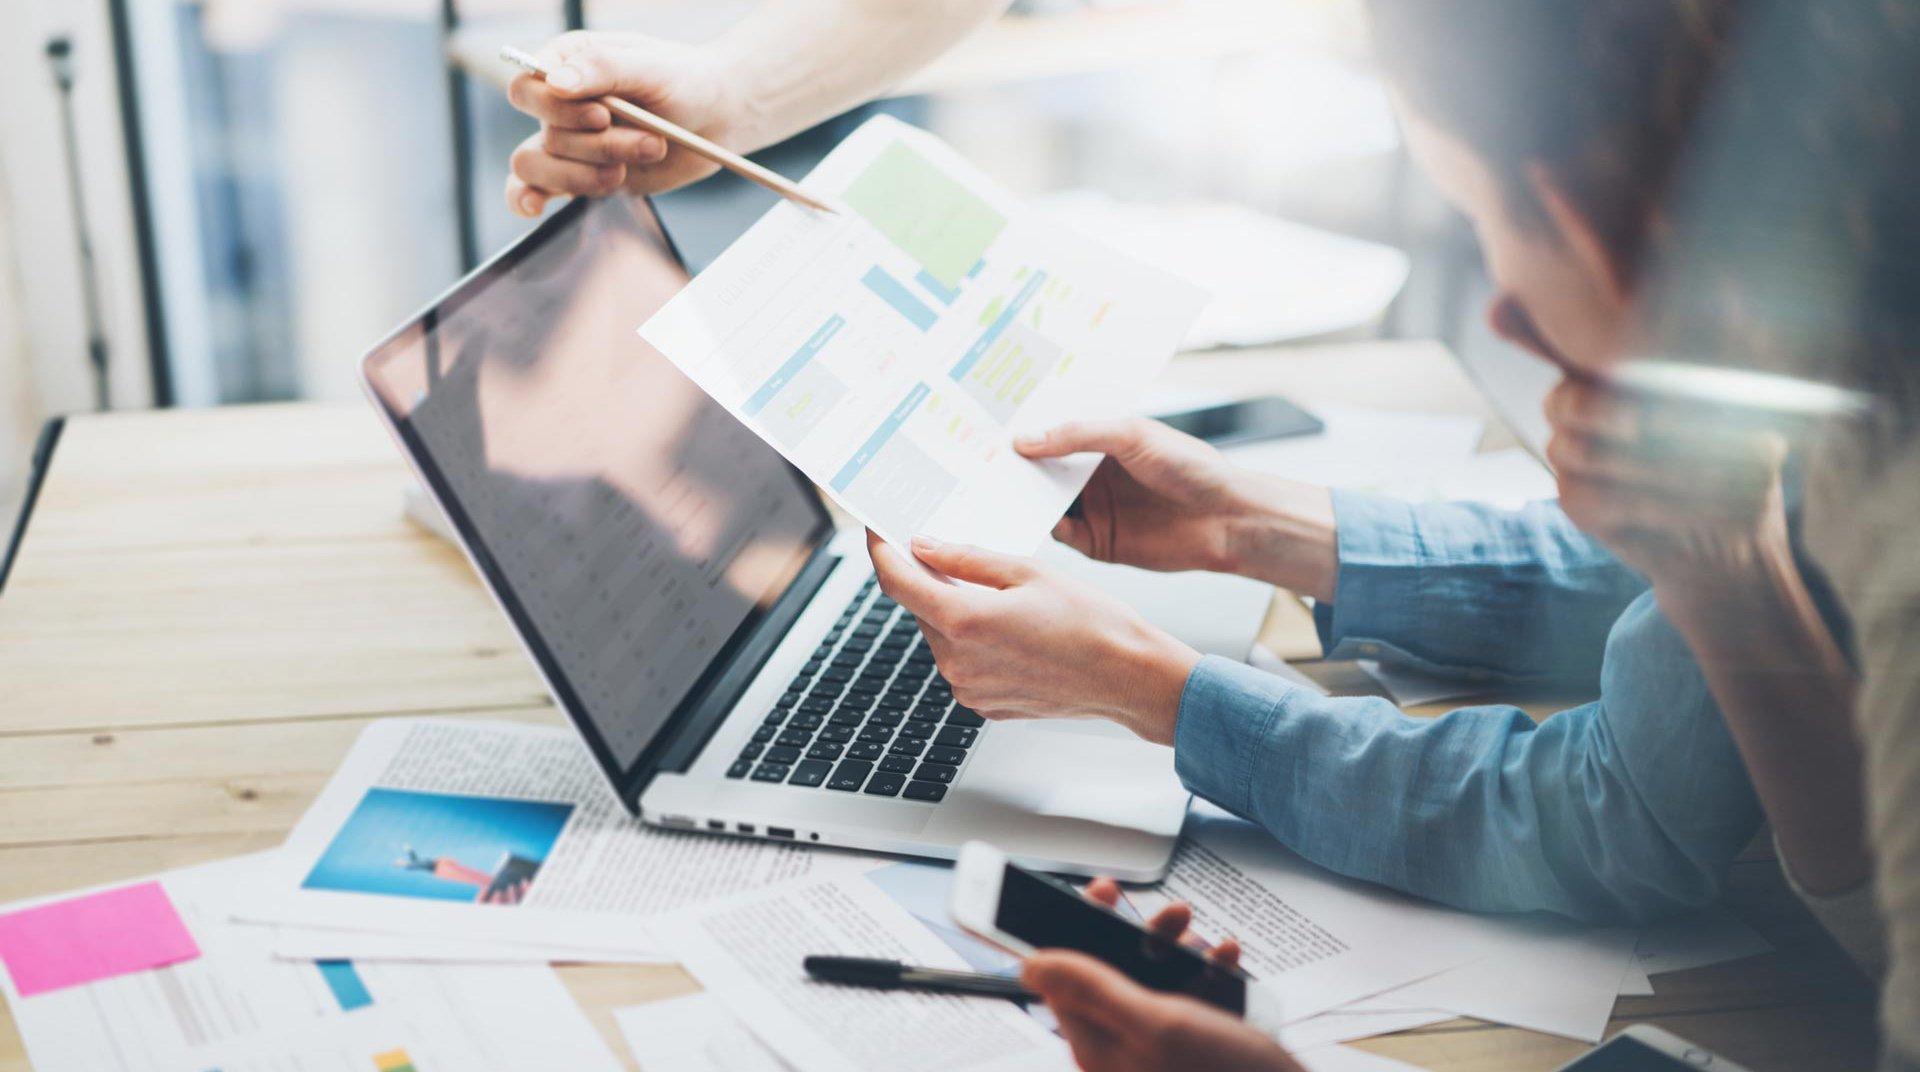 Let's discover your business's optimum productivity.